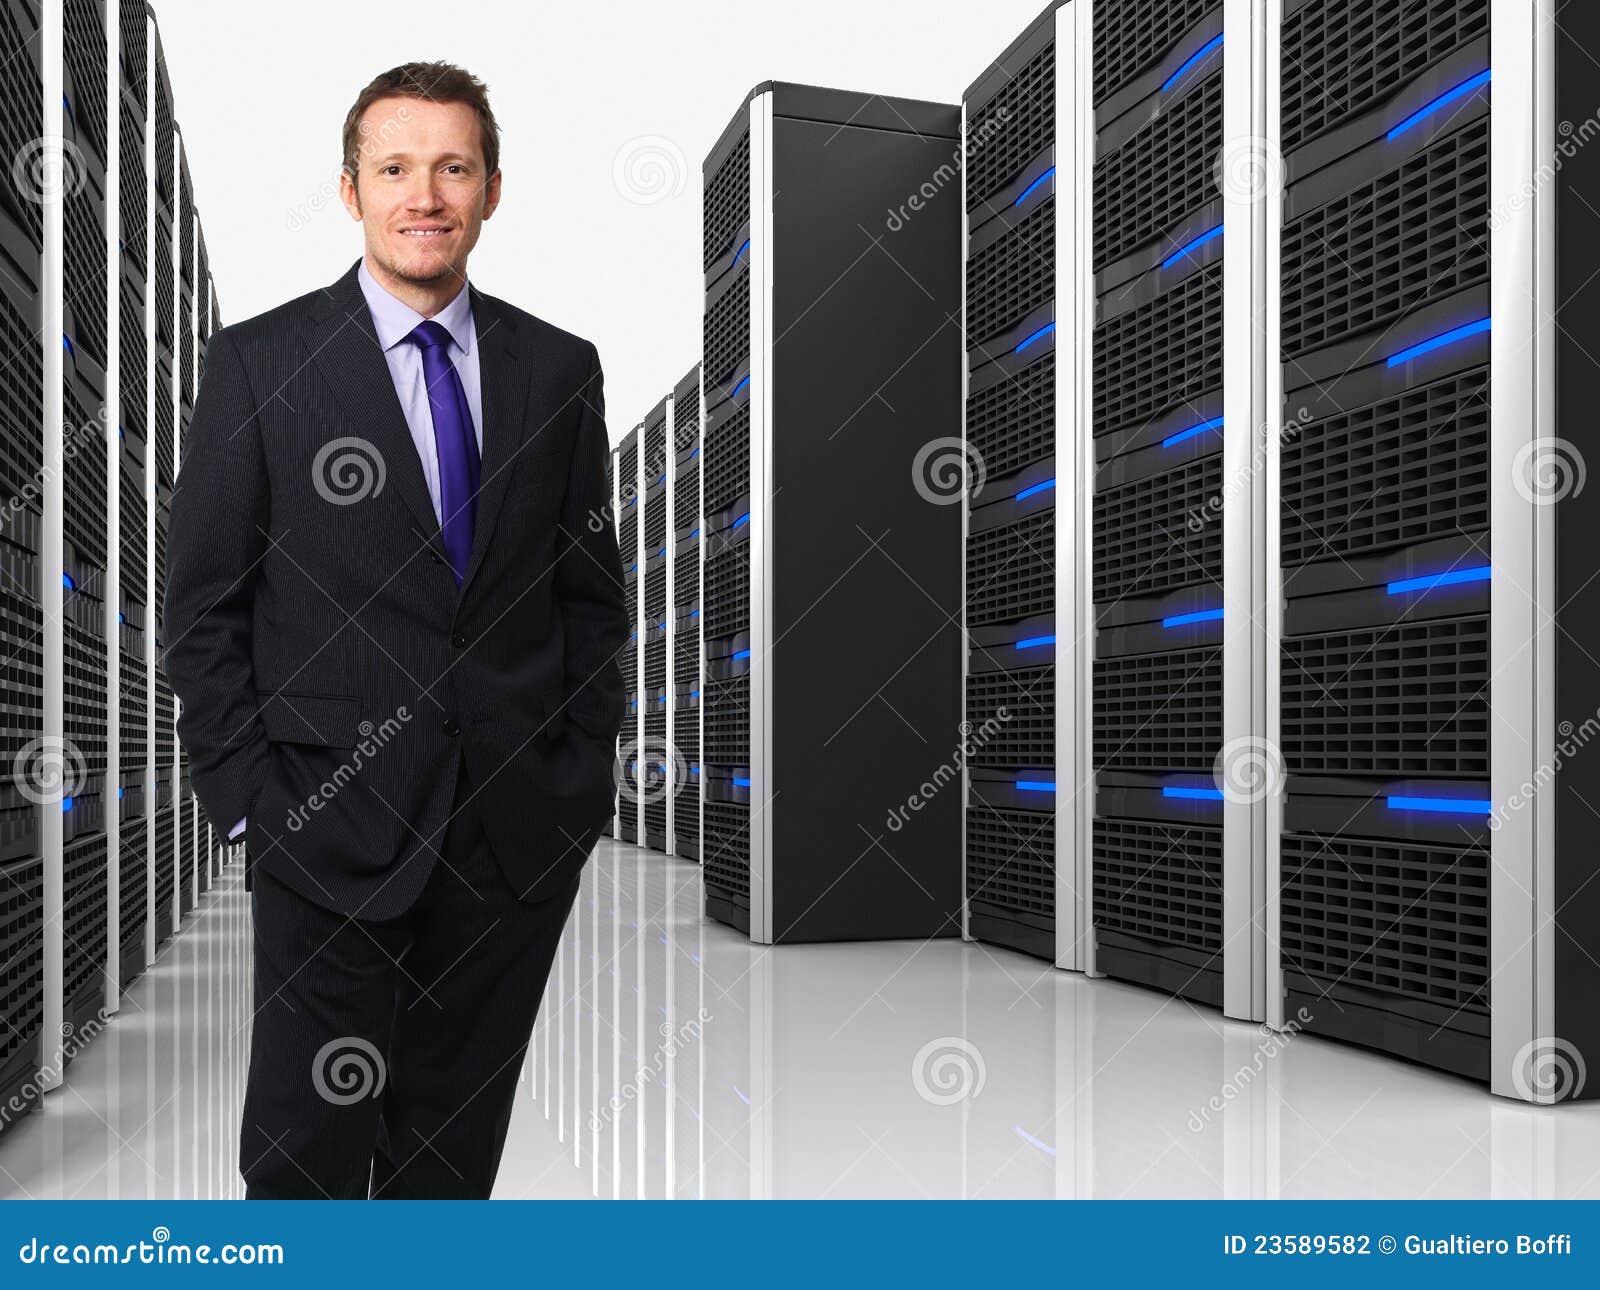 Virtuele 3d server en mens